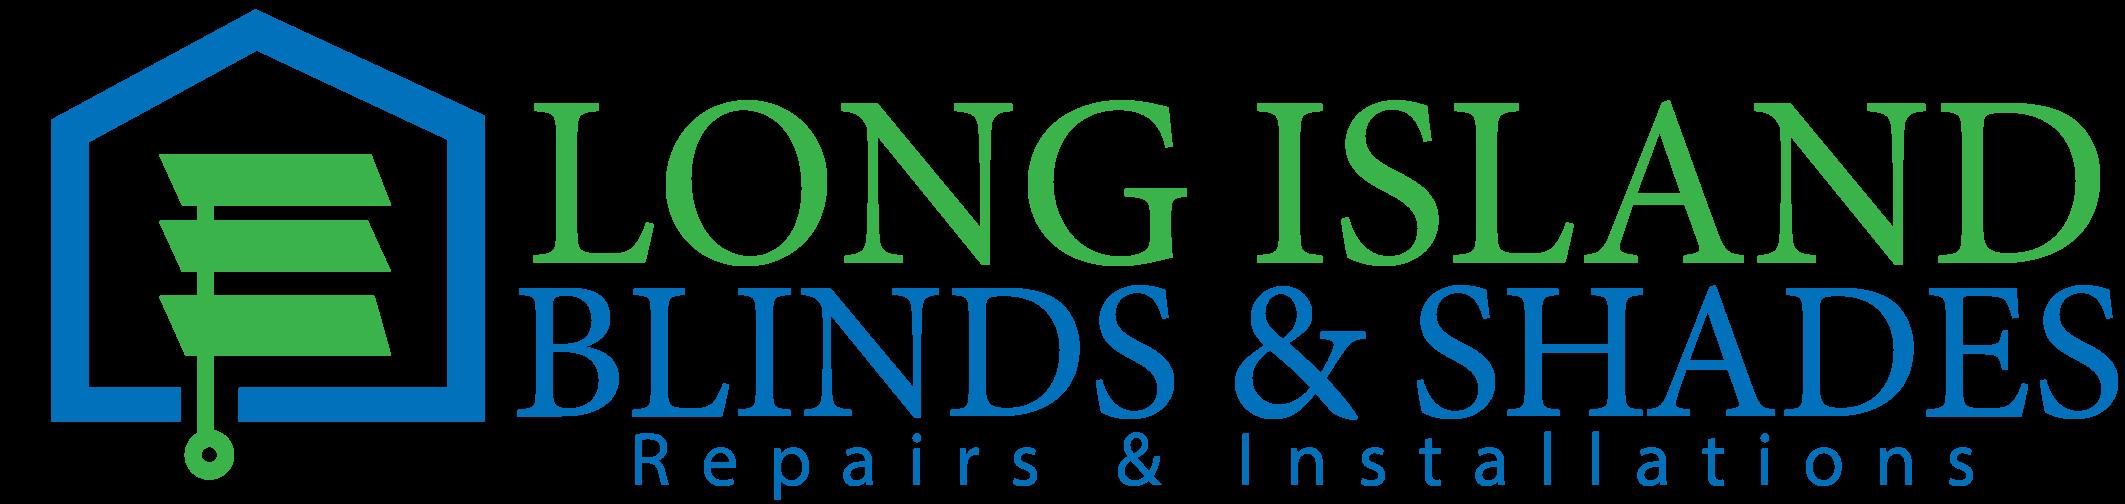 Angelic Blinds Long Island On Site Window Blind Repair